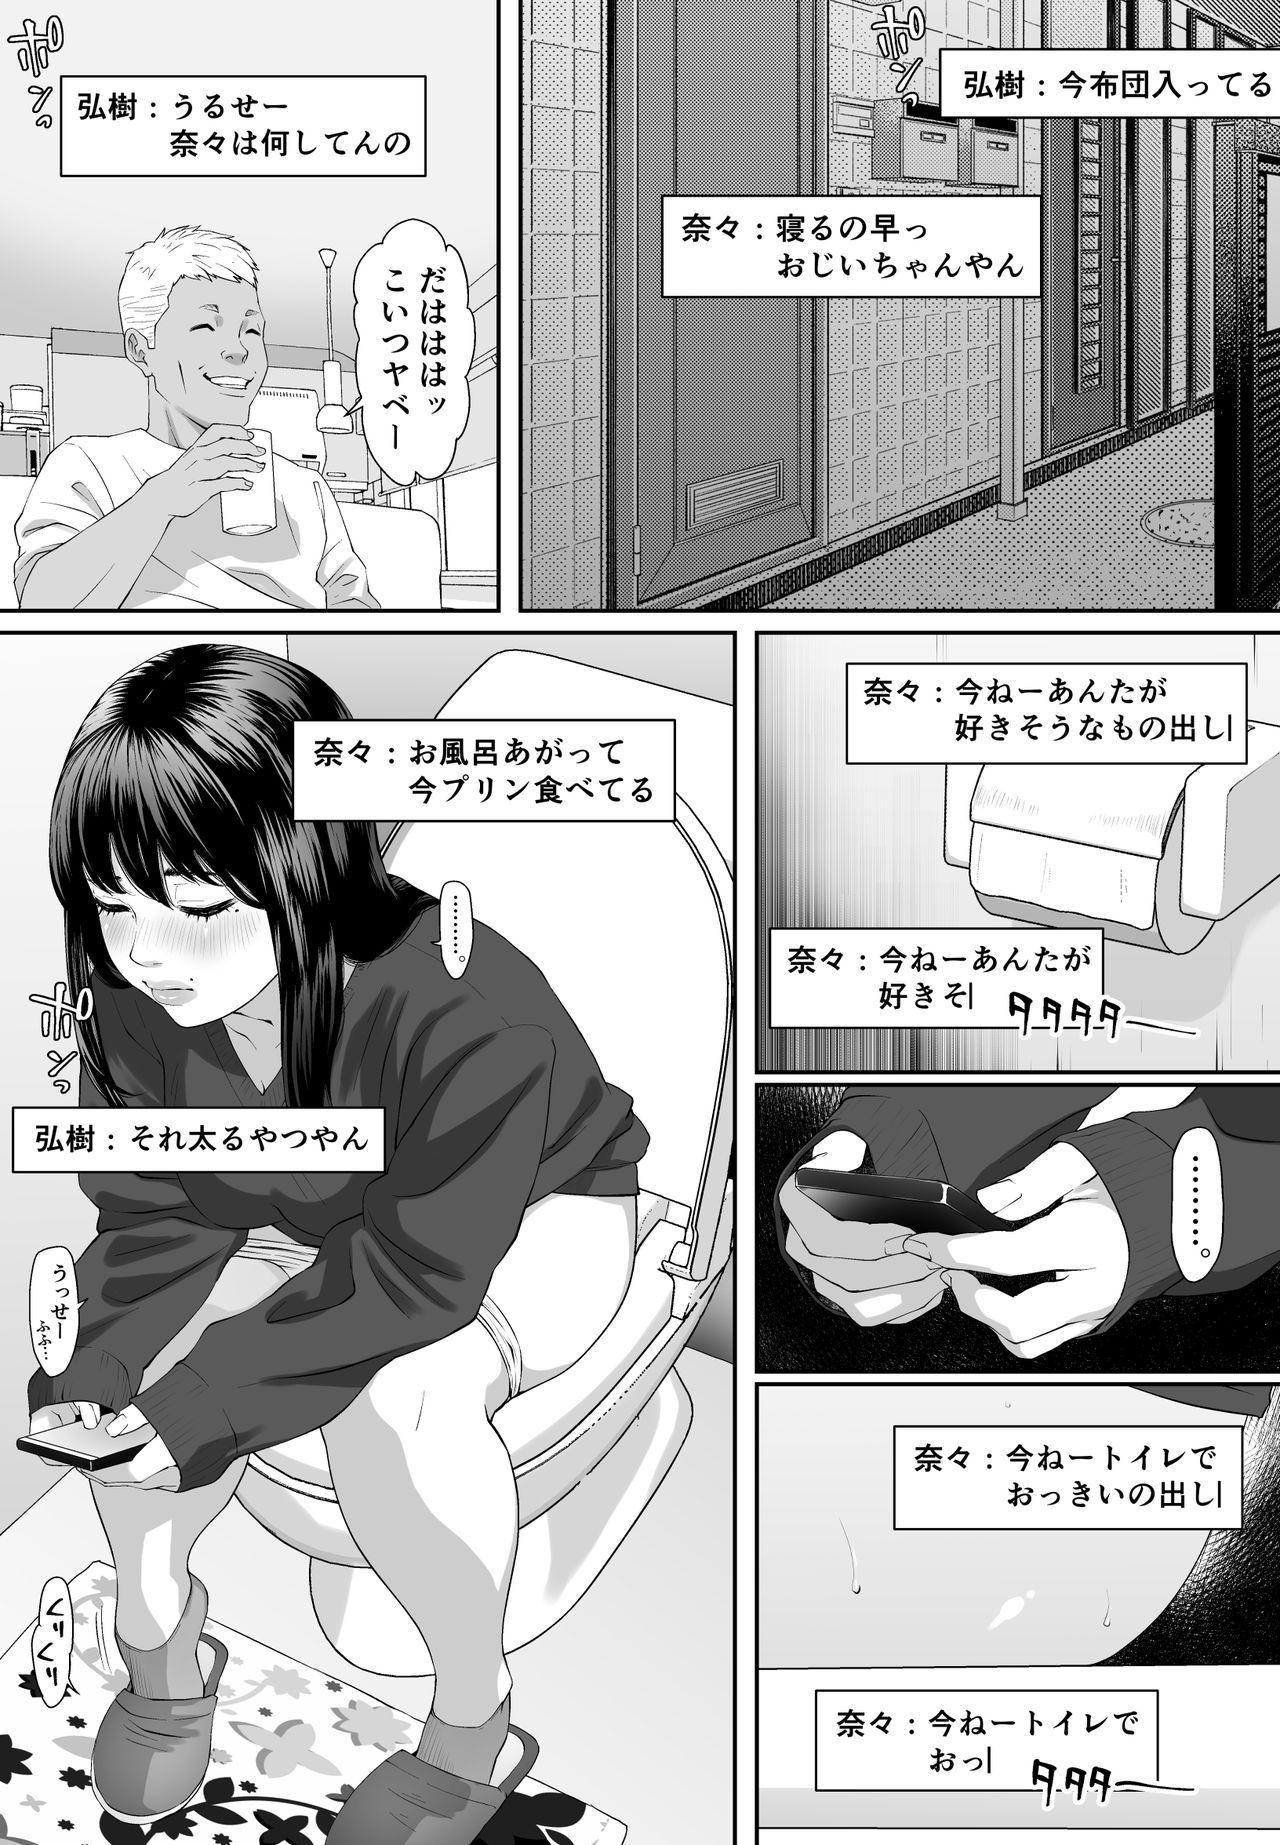 Mild Hentai NANA 10